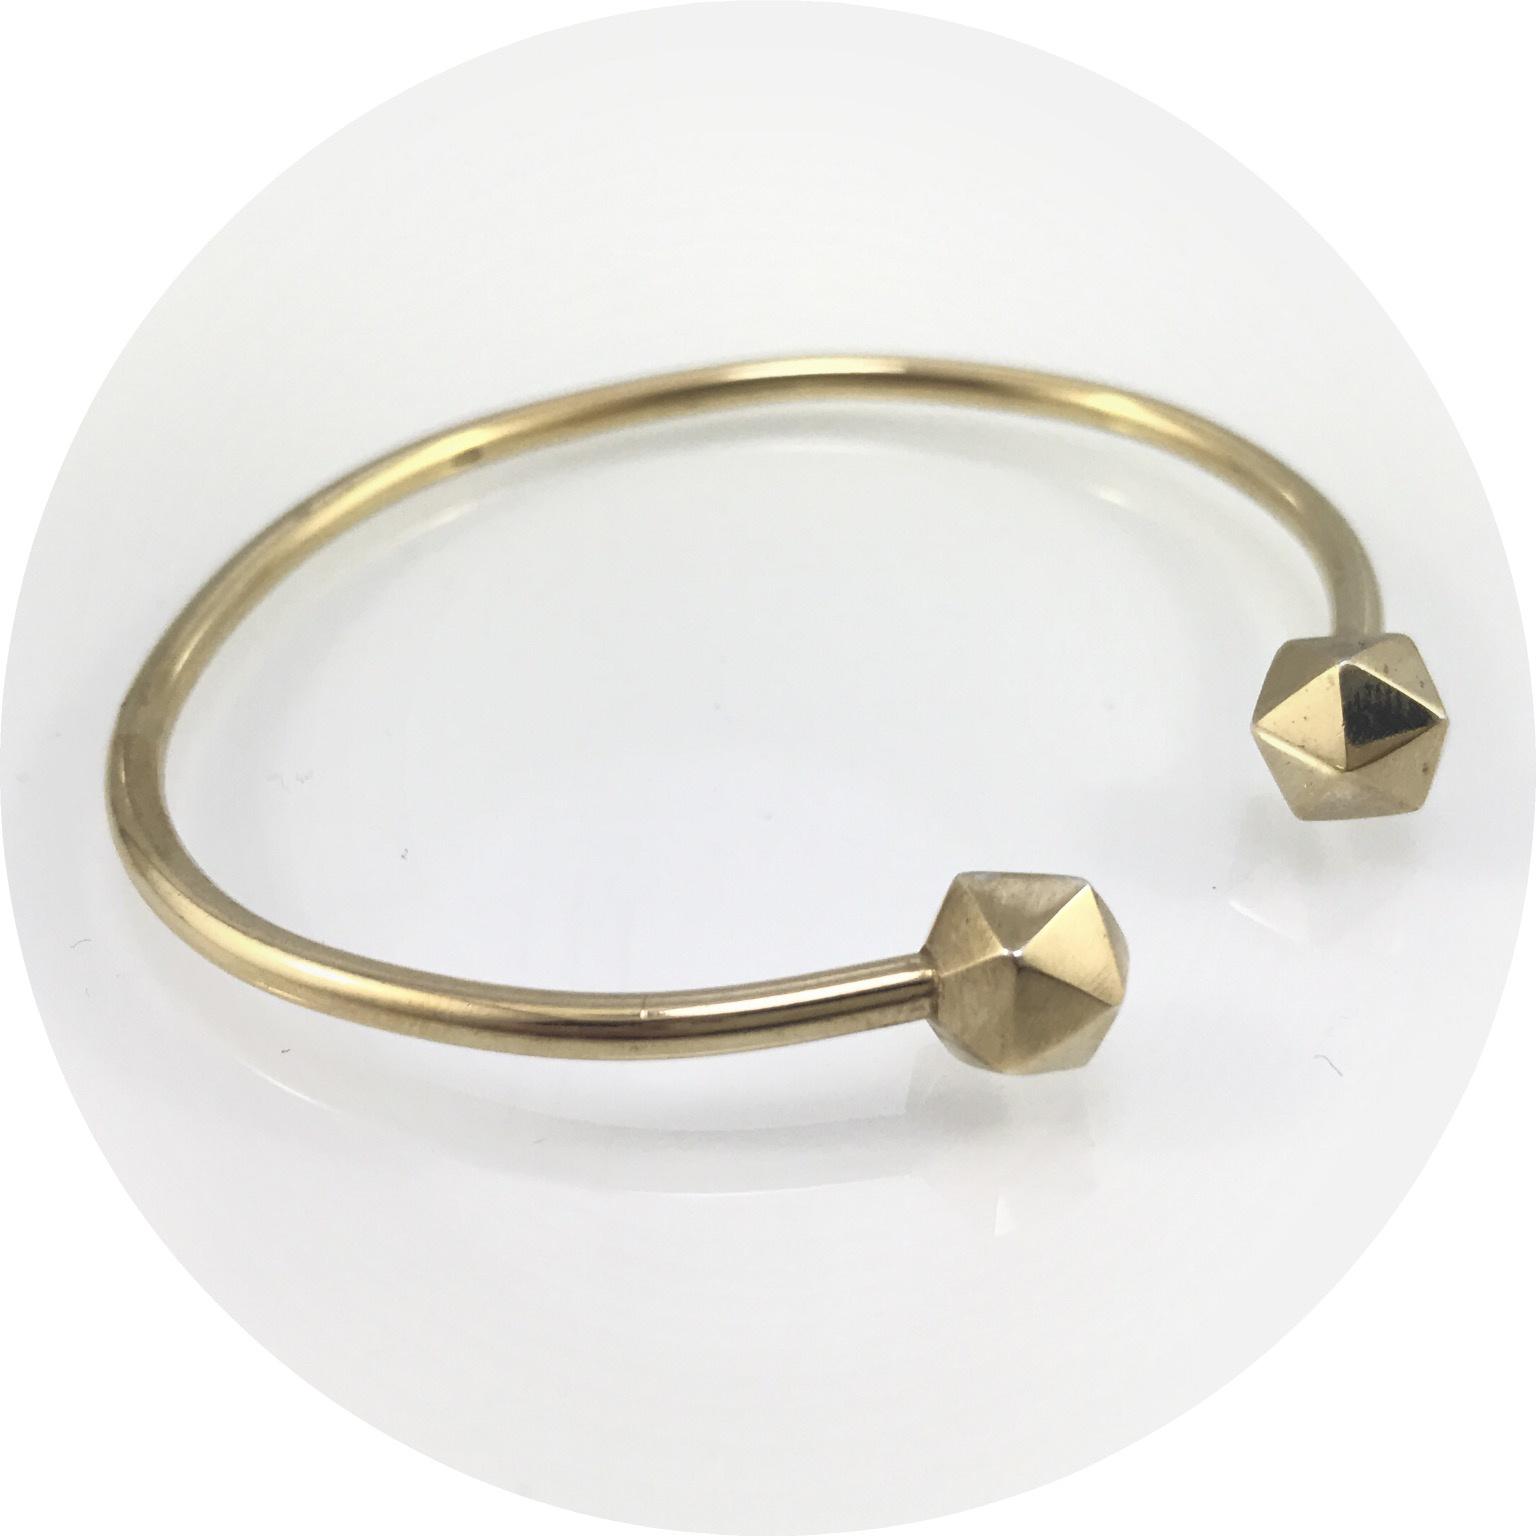 Kimba Pham - 'Icosahedron' Cuff in Gold Vermeil